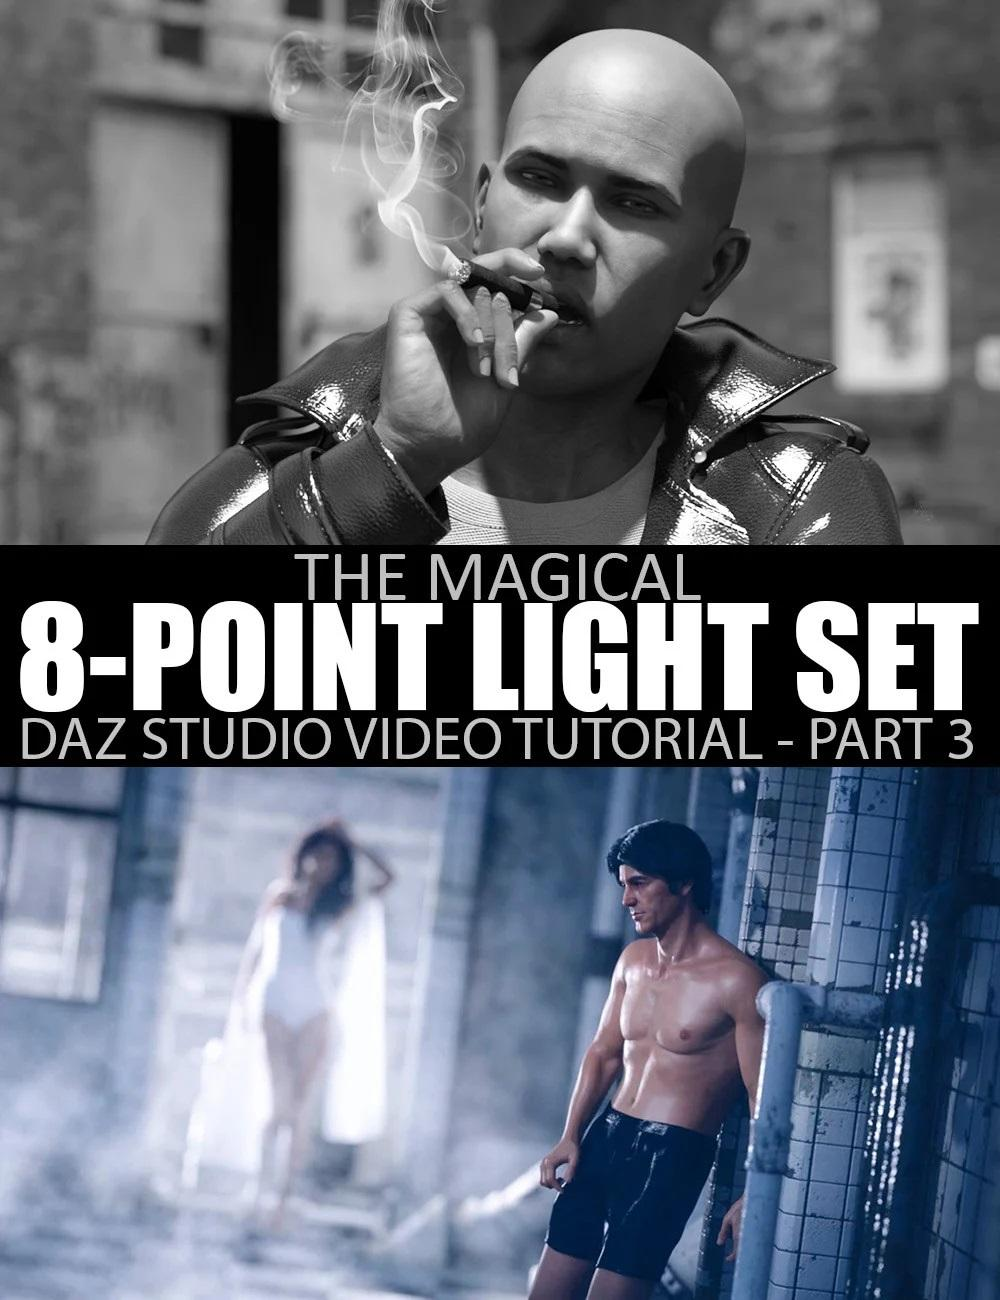 The Magical 8-Point Light Set - Part 3 - DAZ Studio Tutorial